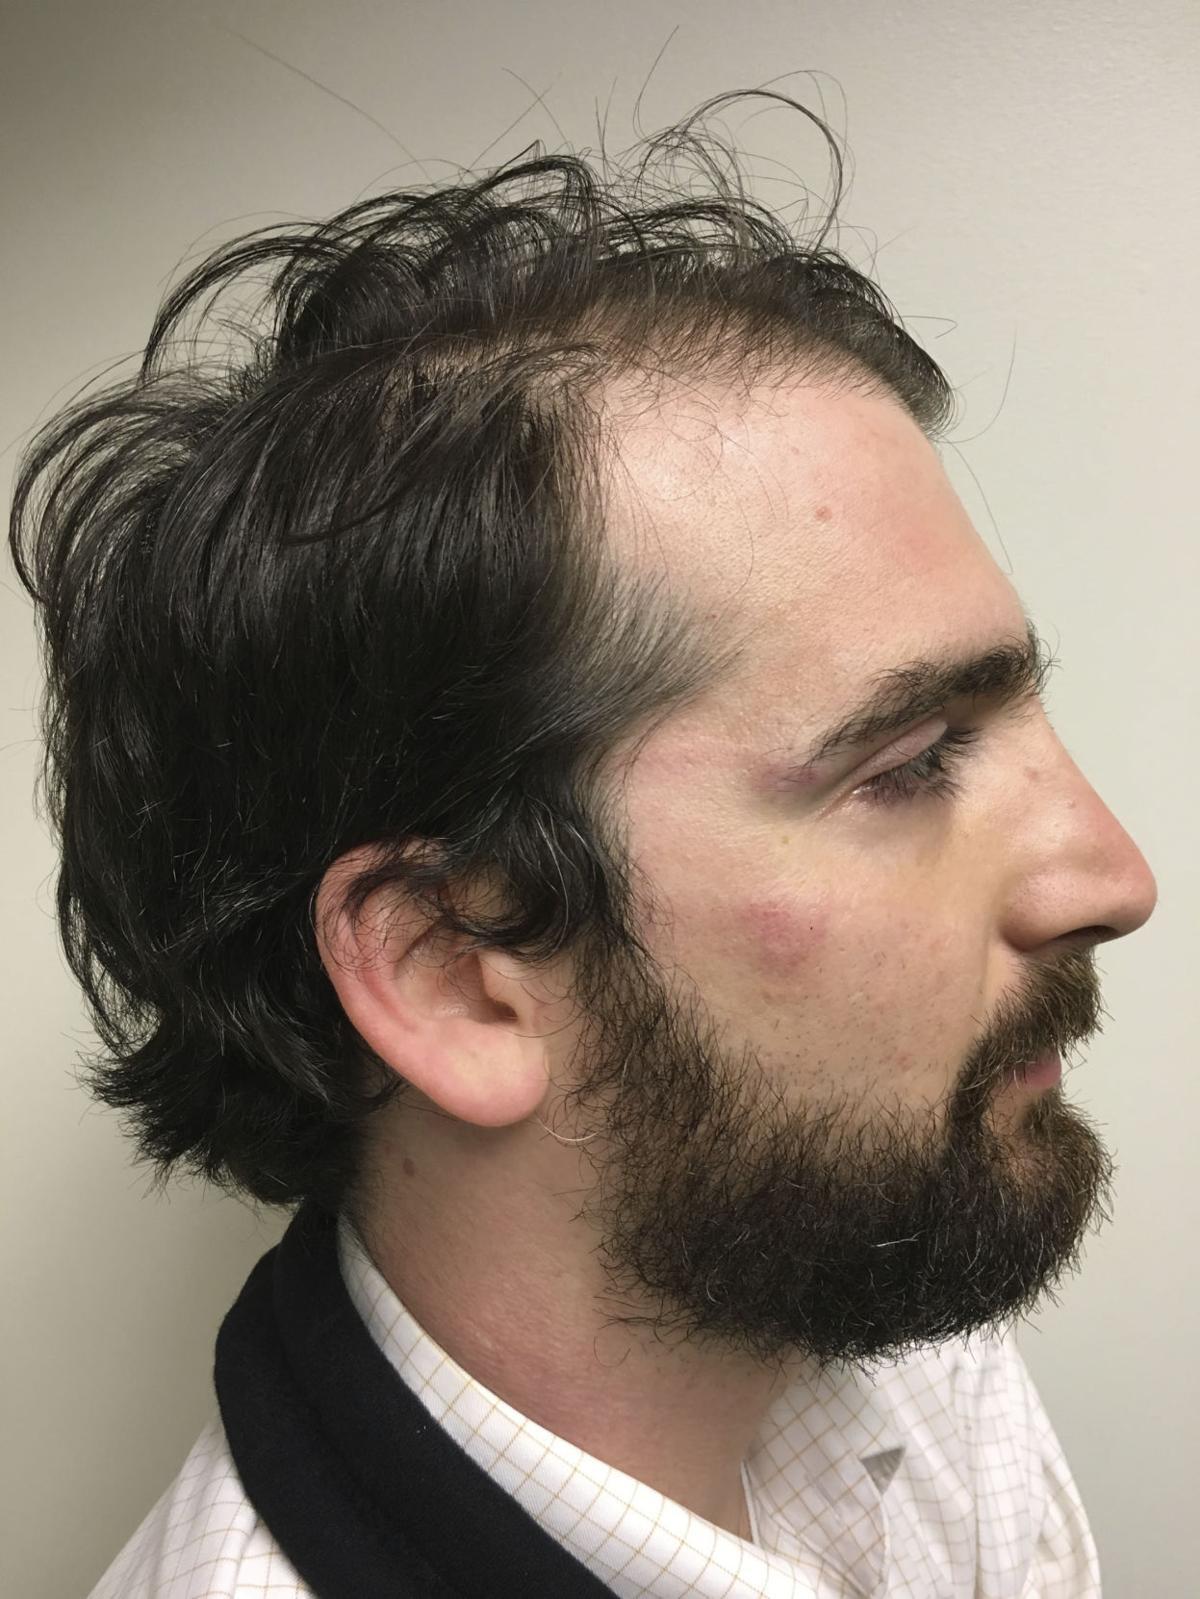 Montana congressman misled investigators in assault case